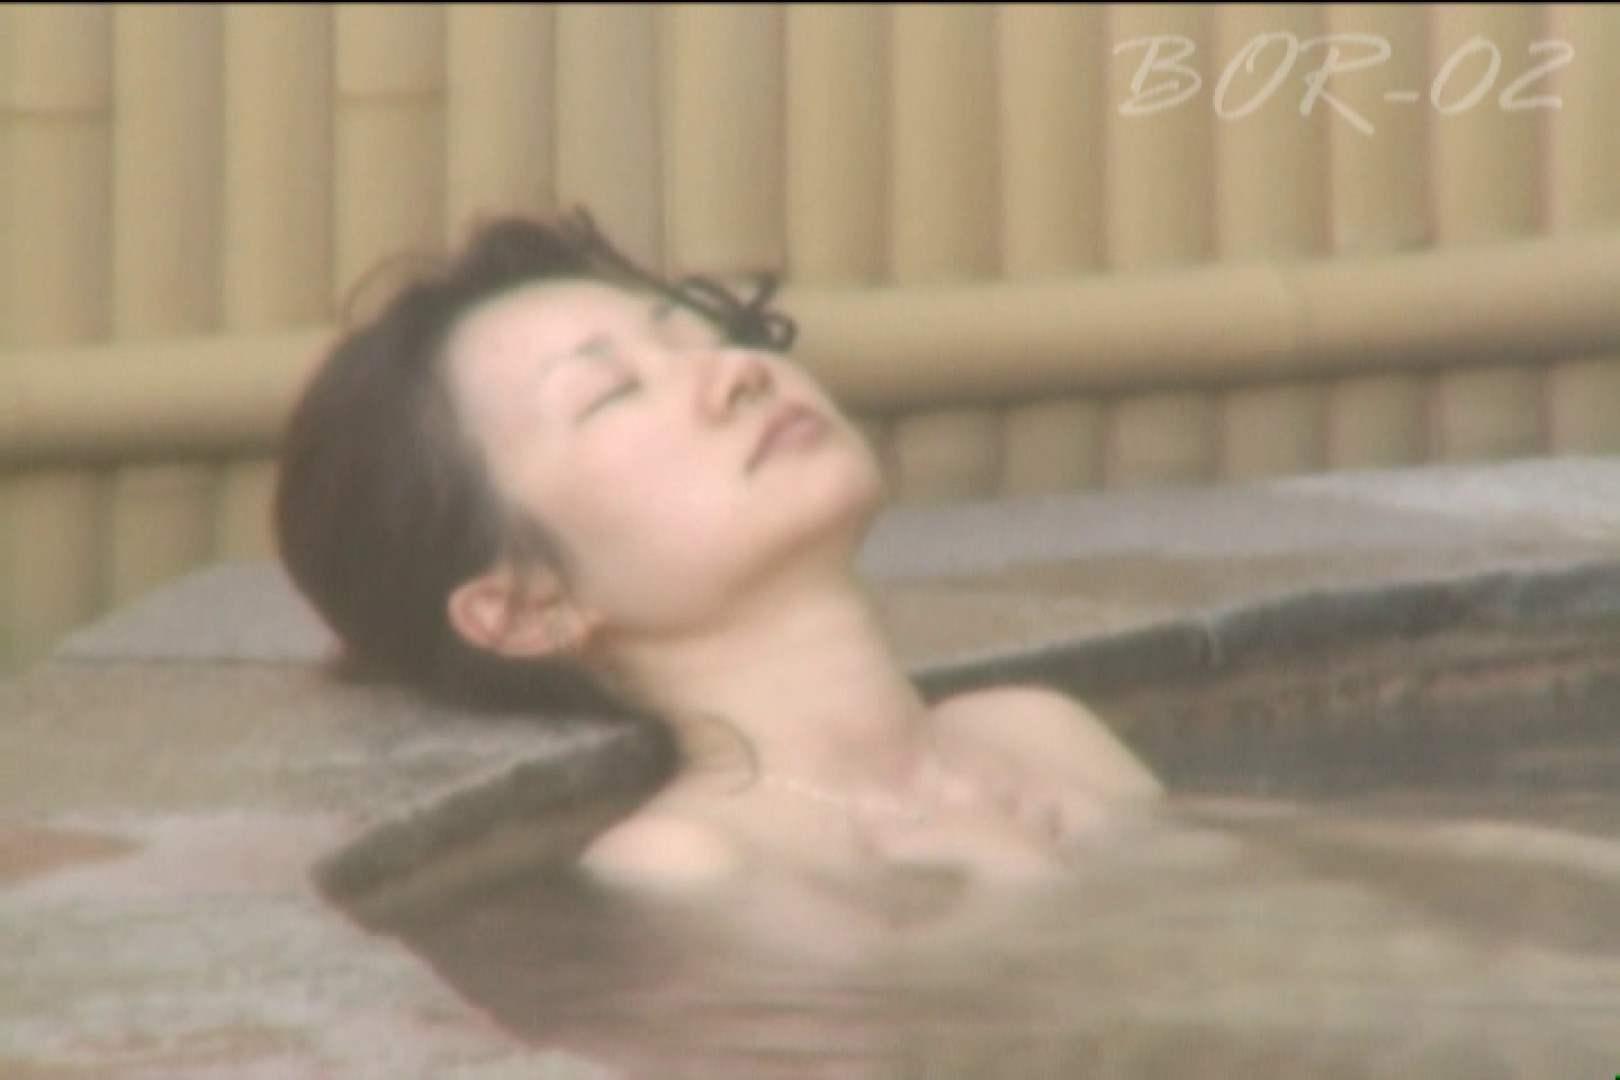 Aquaな露天風呂Vol.477 0  28連発 16